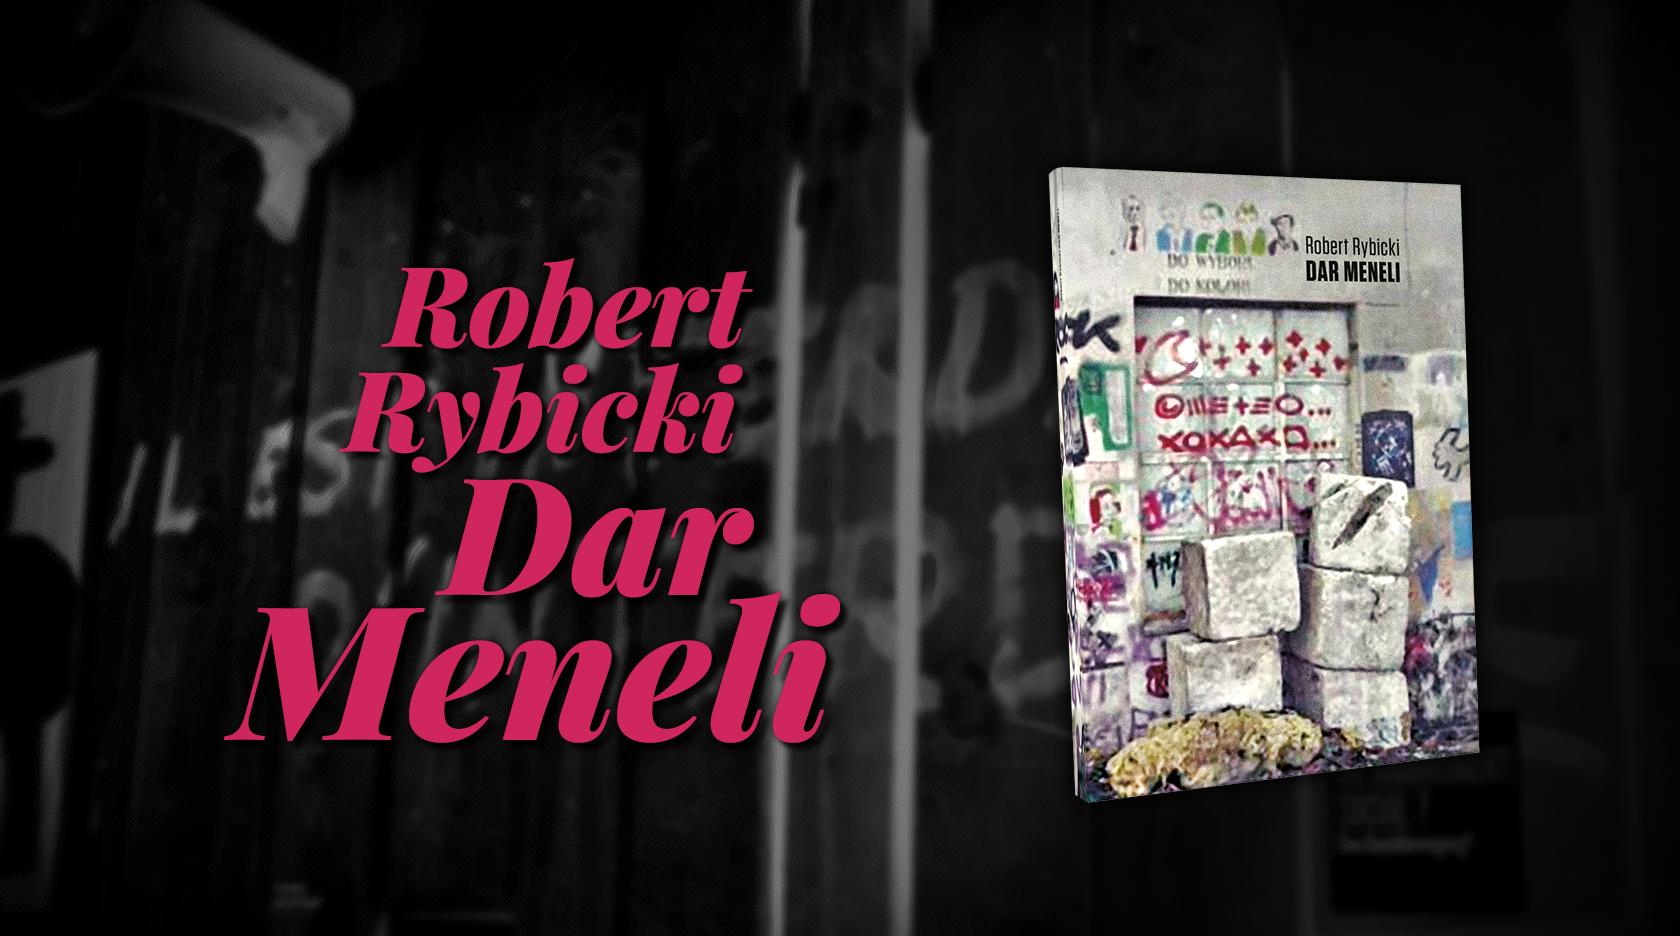 BL Img 2017.04.17 Robert RYBICKI Dar Meneli_www_top